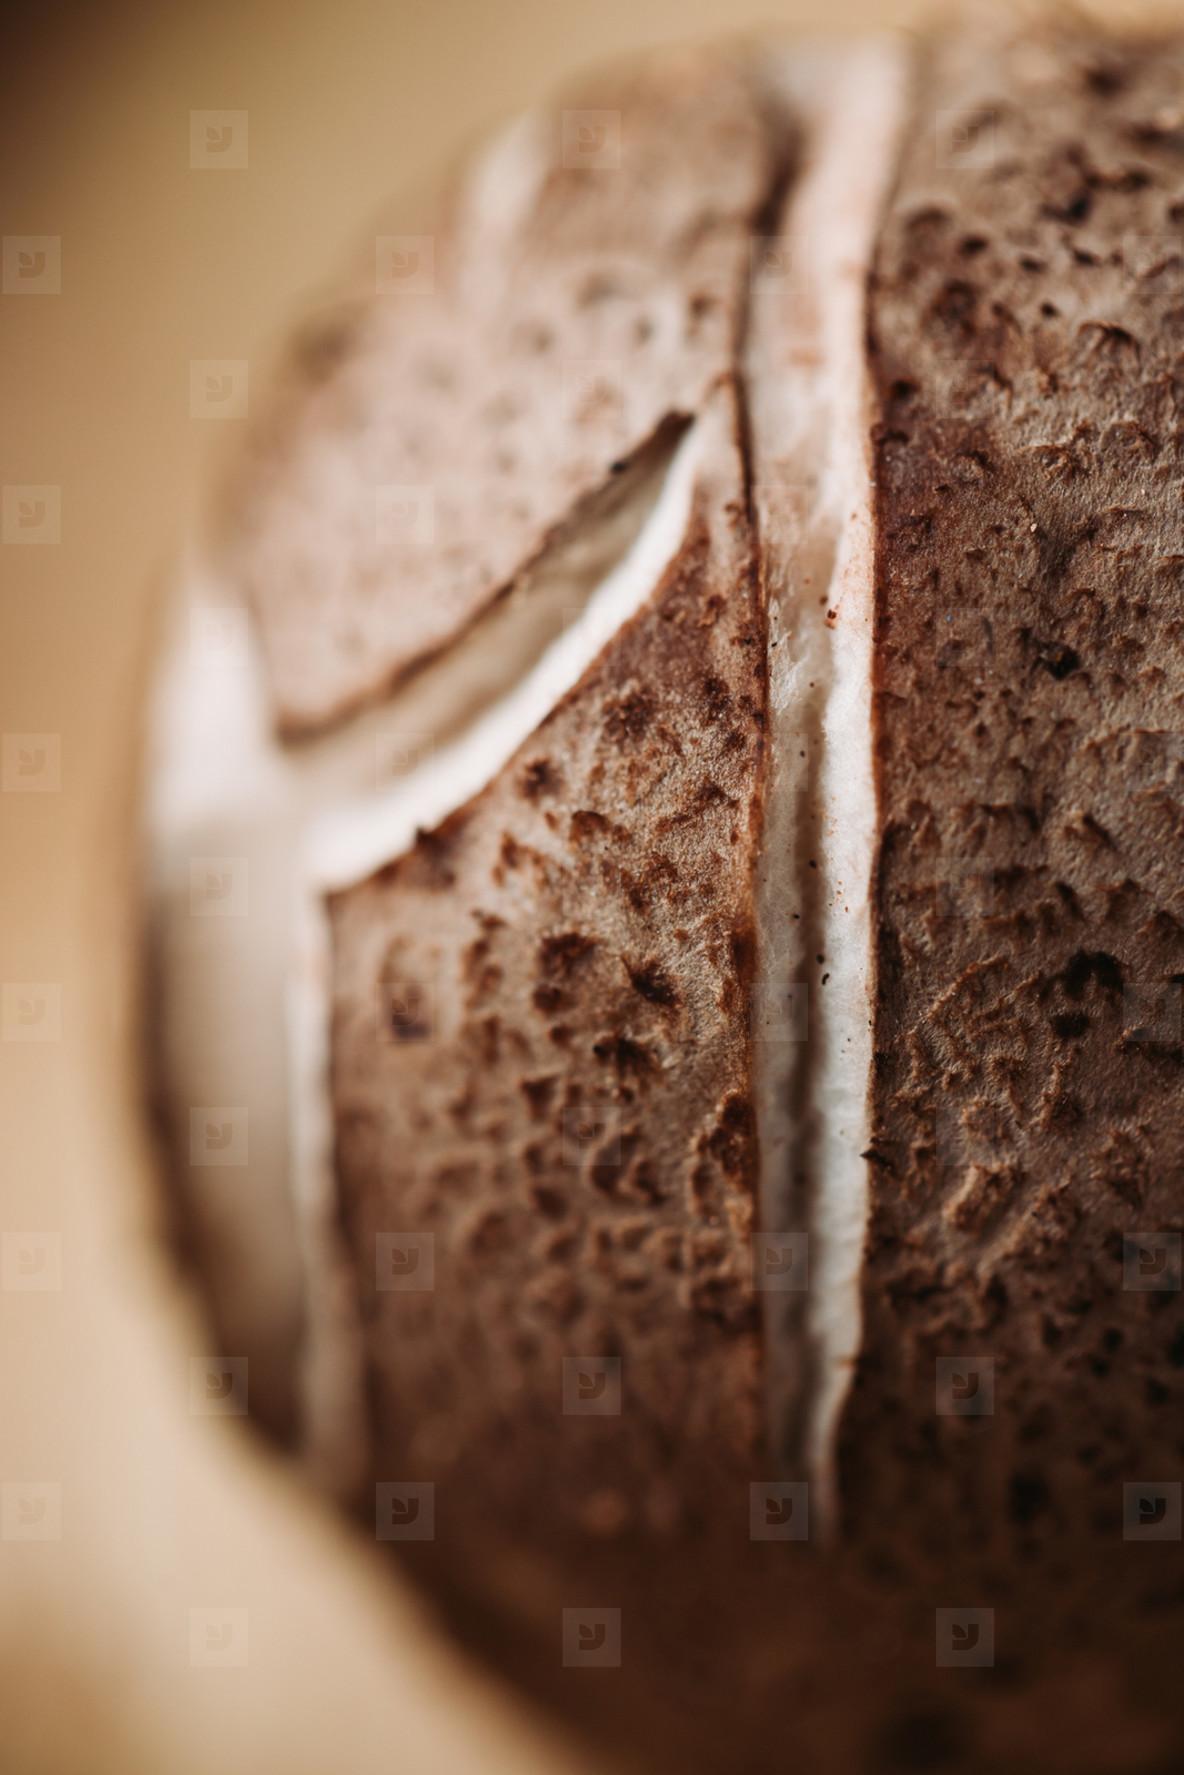 Macro photography of shiitake mushroom pileus  Creative food photography